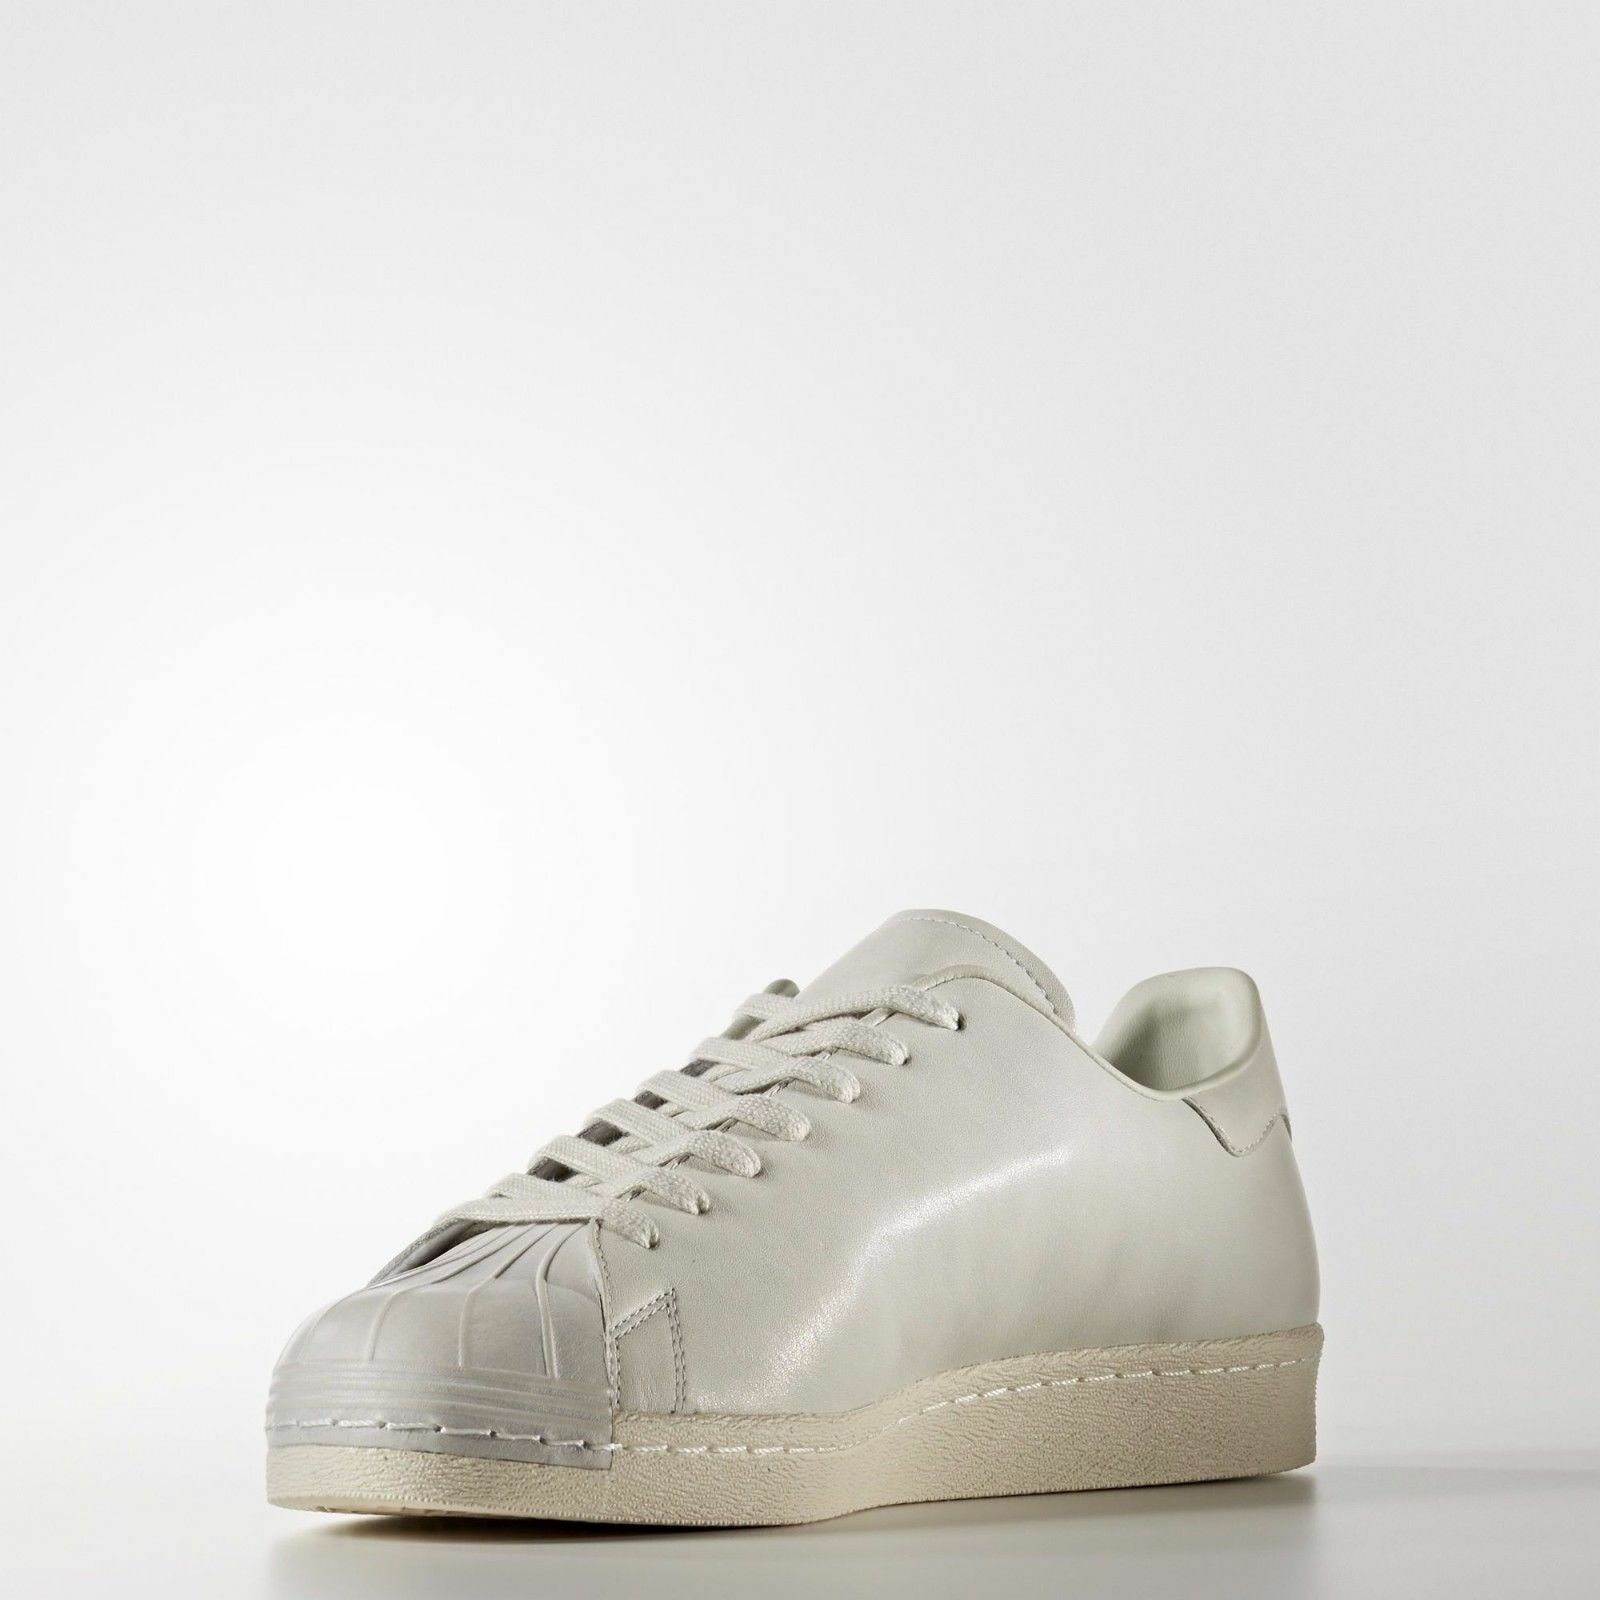 Adidas Originals Men's Superstar 80s Clean shoes Size 8.5 us BB0169 LAST PAIR